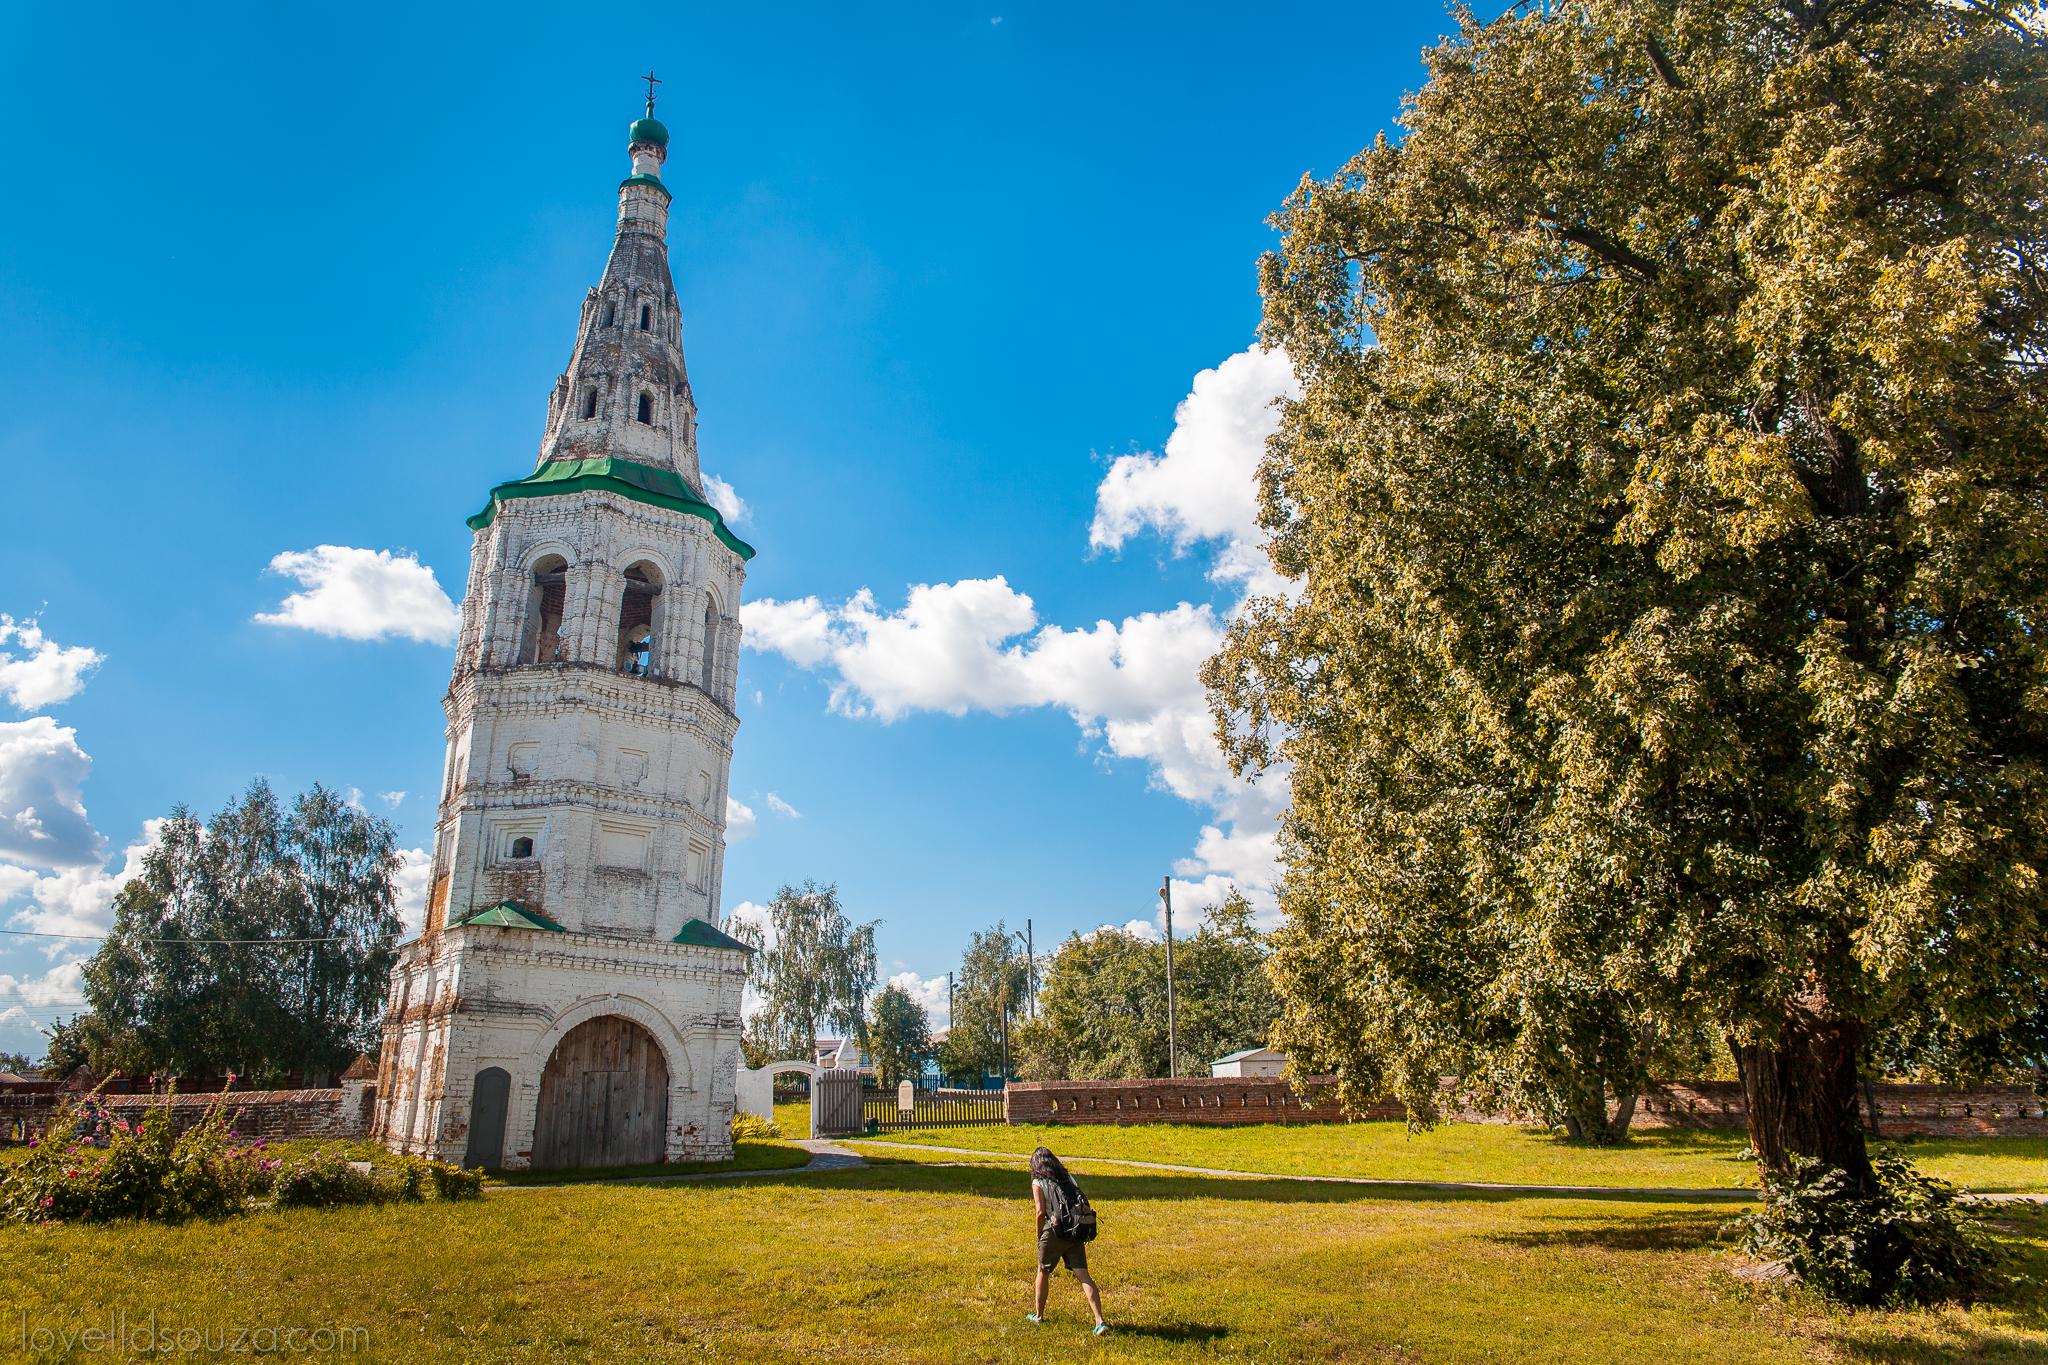 The Bell Tower of the Church of Boris and Gleb (Kideksha)